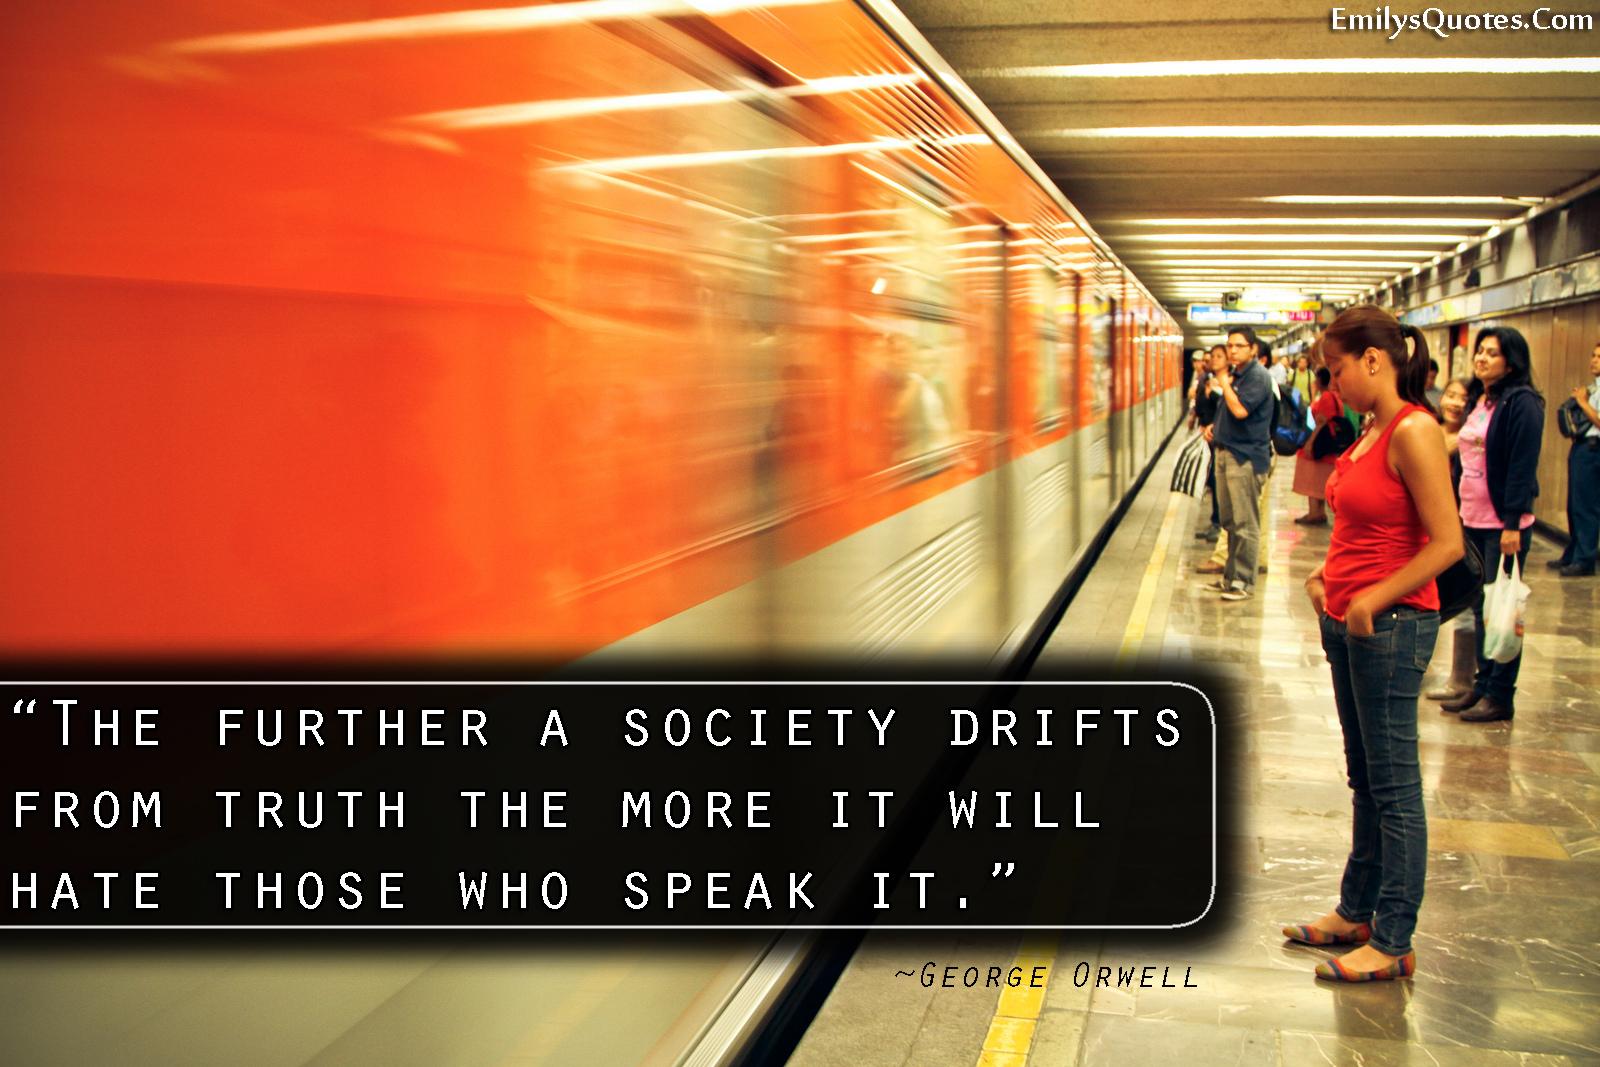 EmilysQuotes.Com - society, people, truth, hate, relationship, ignorance, intelligence, George Orwell